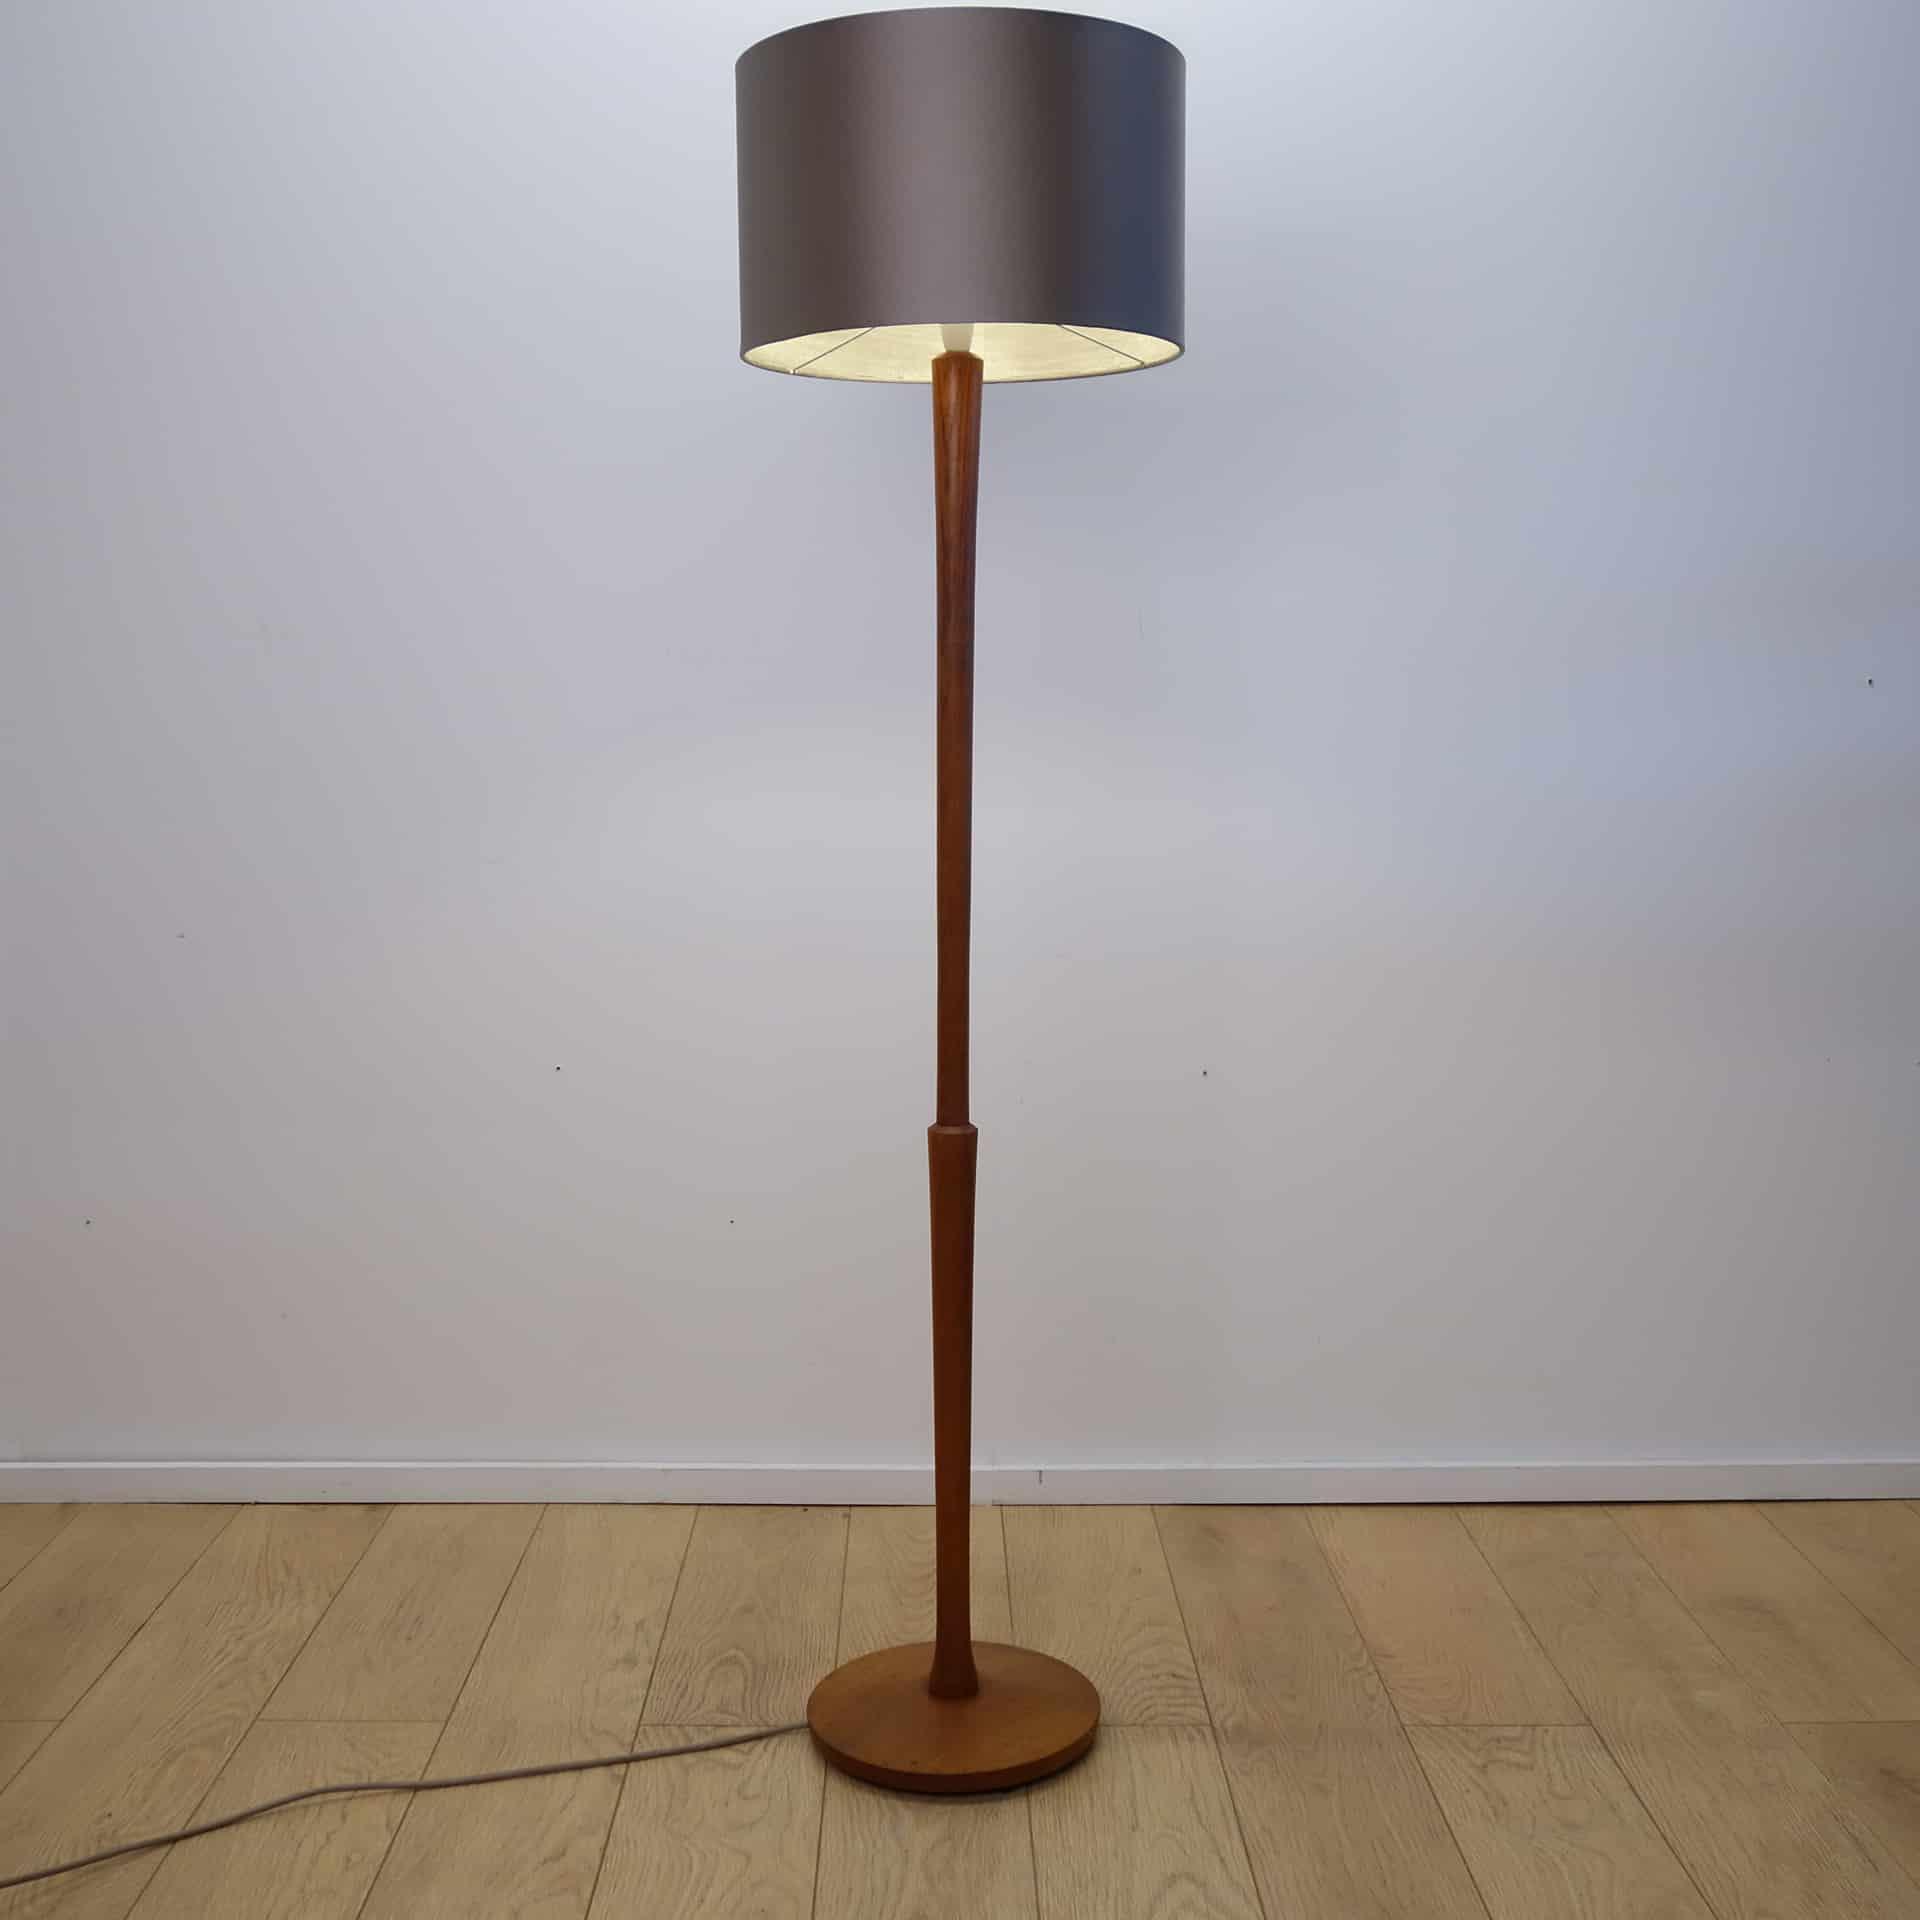 1960s teak standard lamp with grey shade